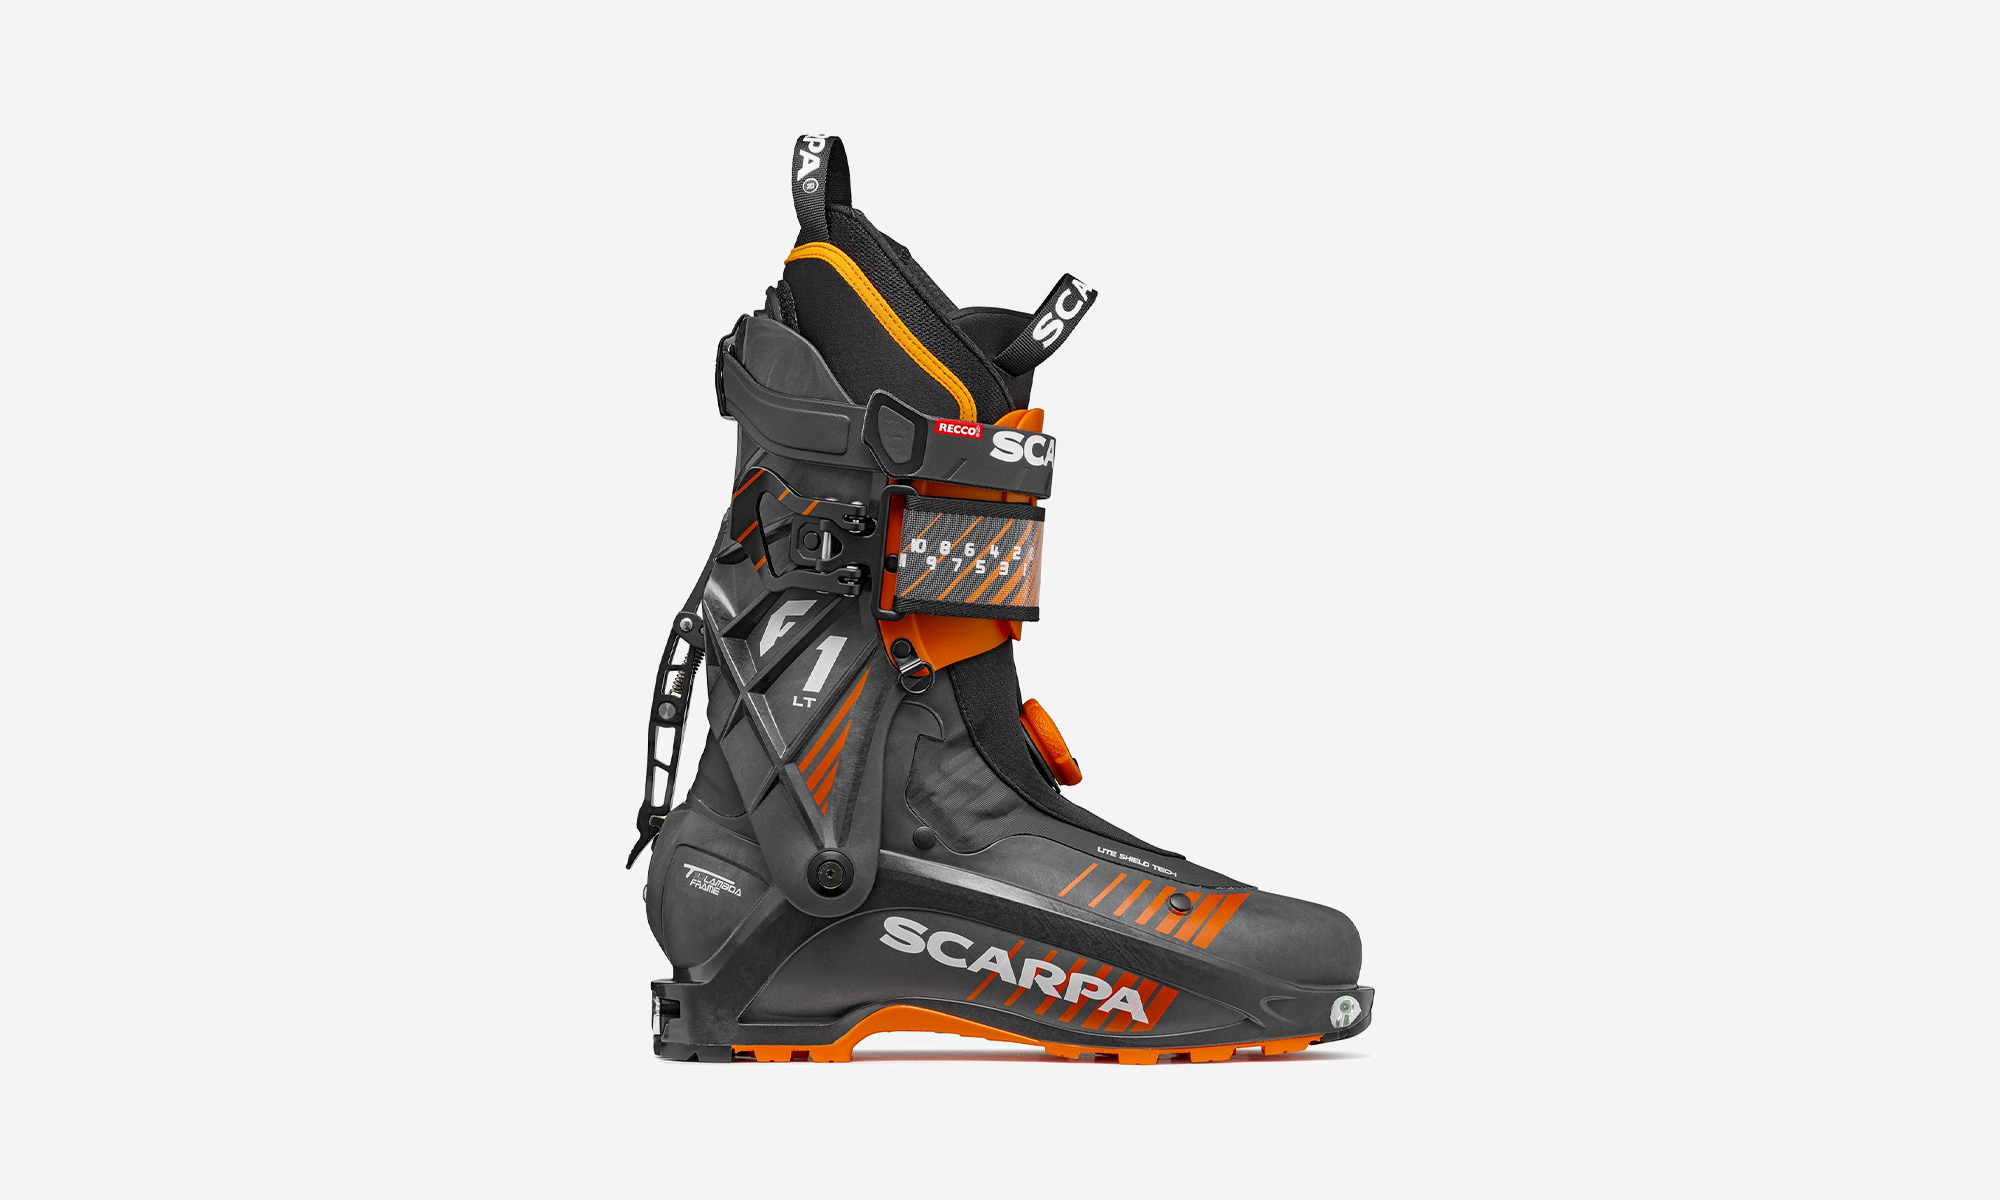 Scarpa-F1-LT